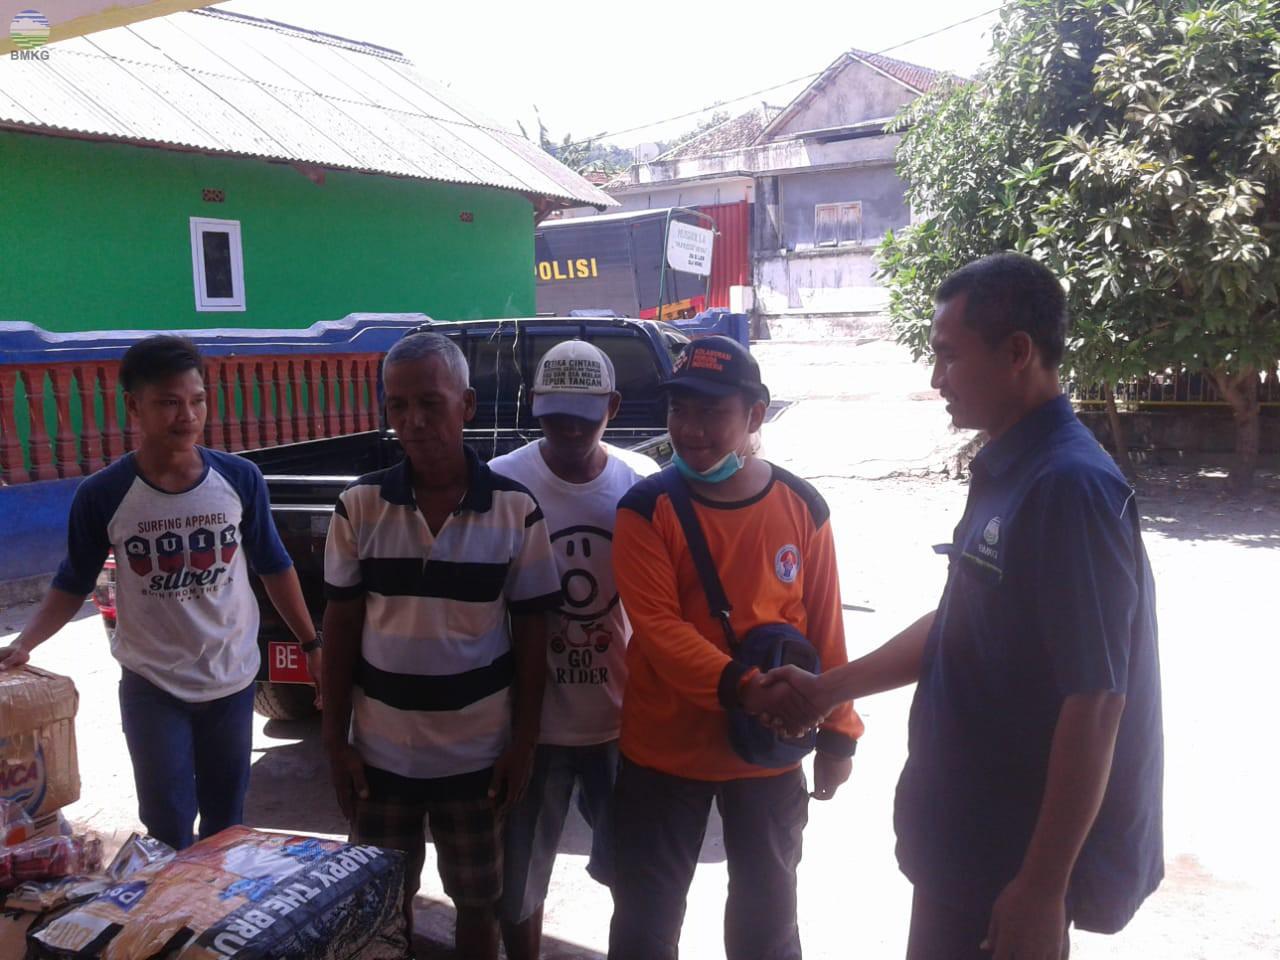 Stamet BMKG Lampung Ikut Peduli Korban Tsunami Selat Sunda